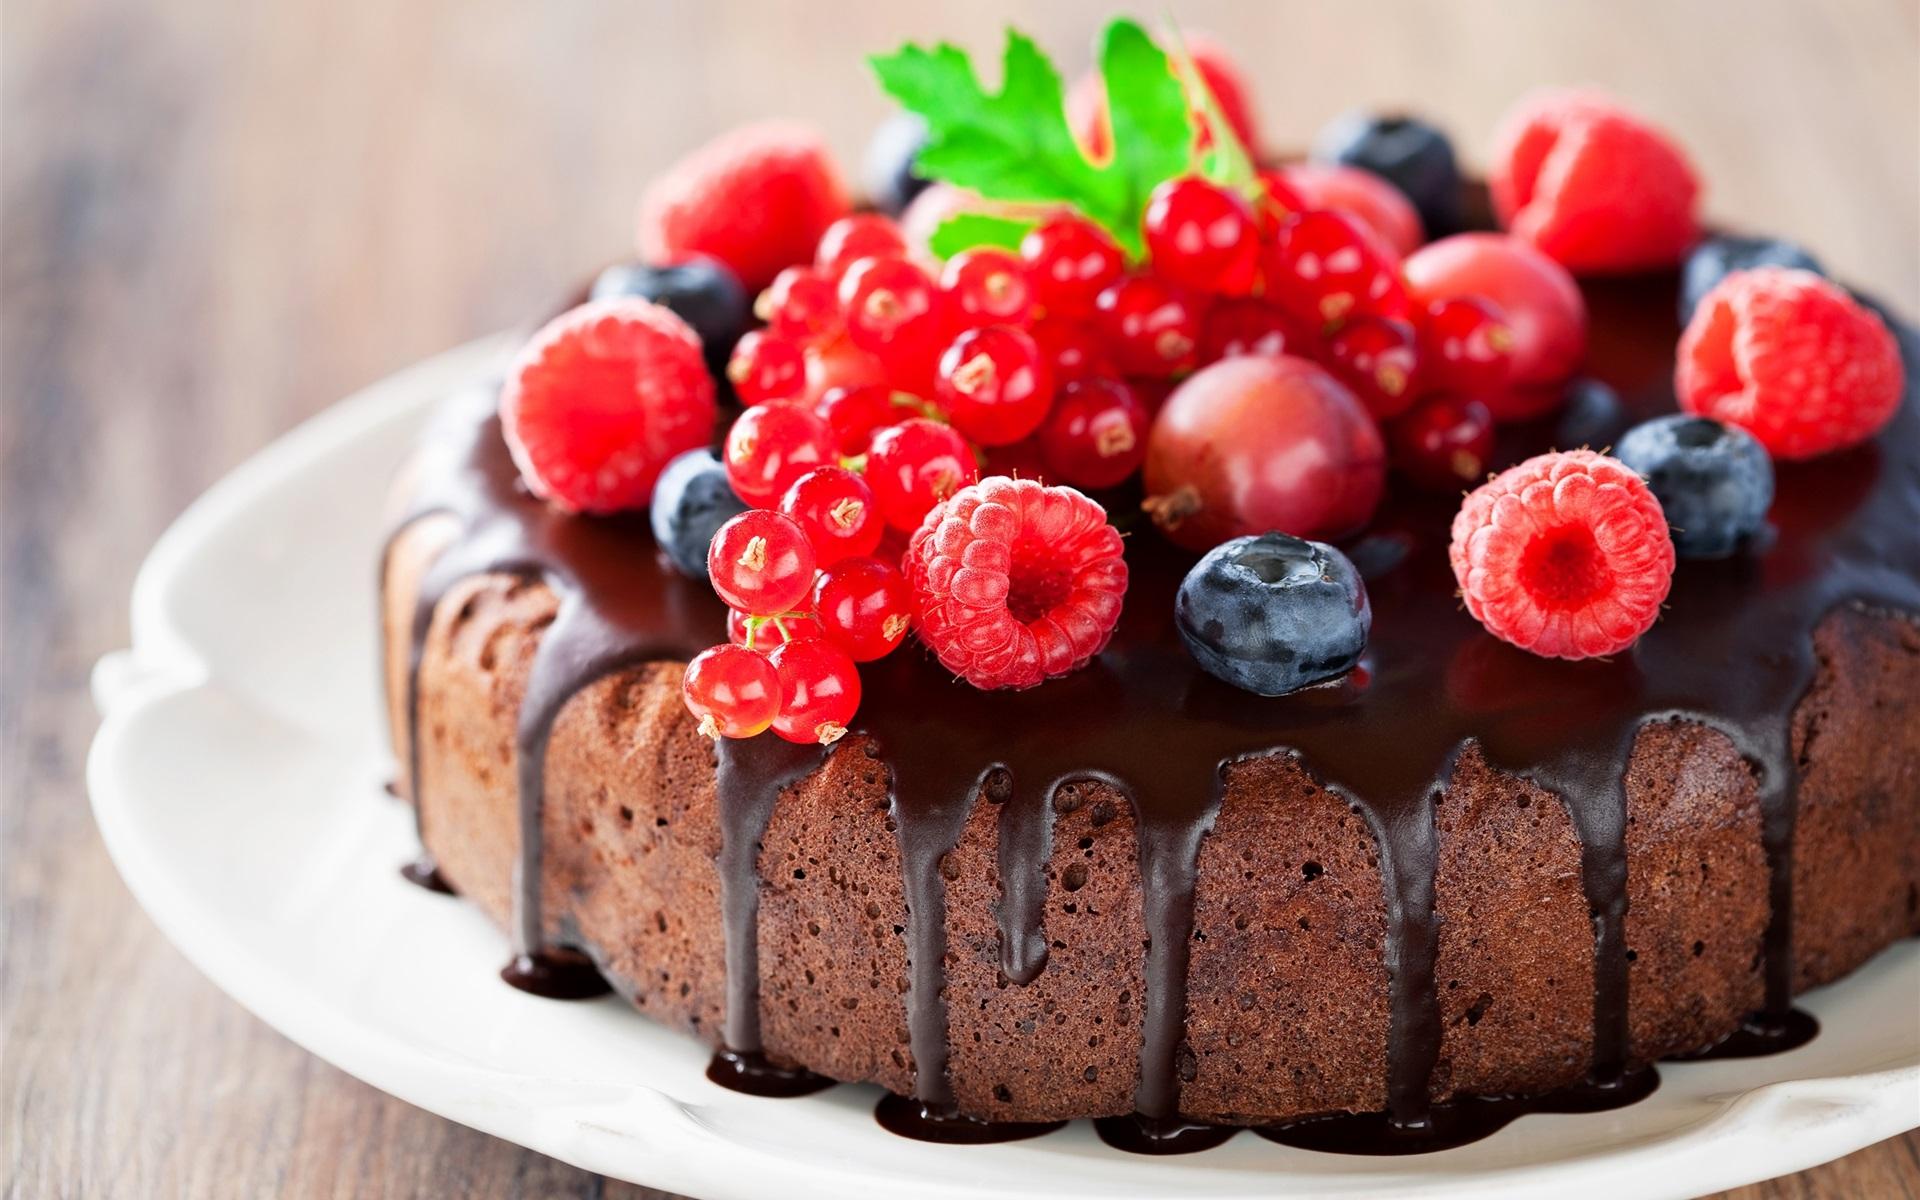 Download Wallpaper 1920x1200 Berries Cake Dessert